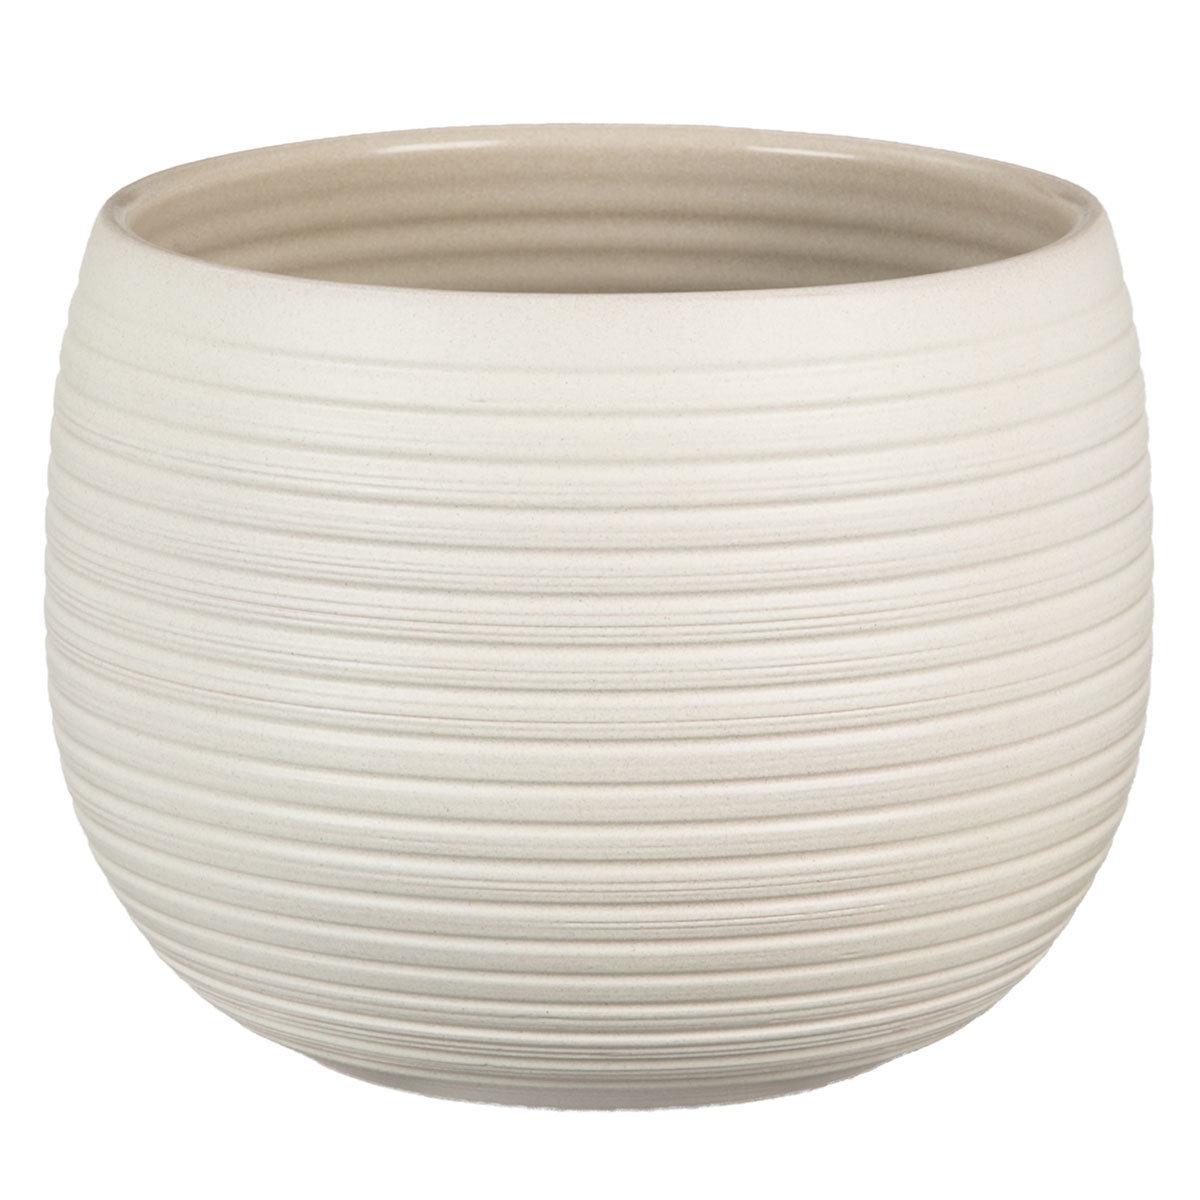 Scheurich Keramik-Übertopf Cream Stone 21 cm